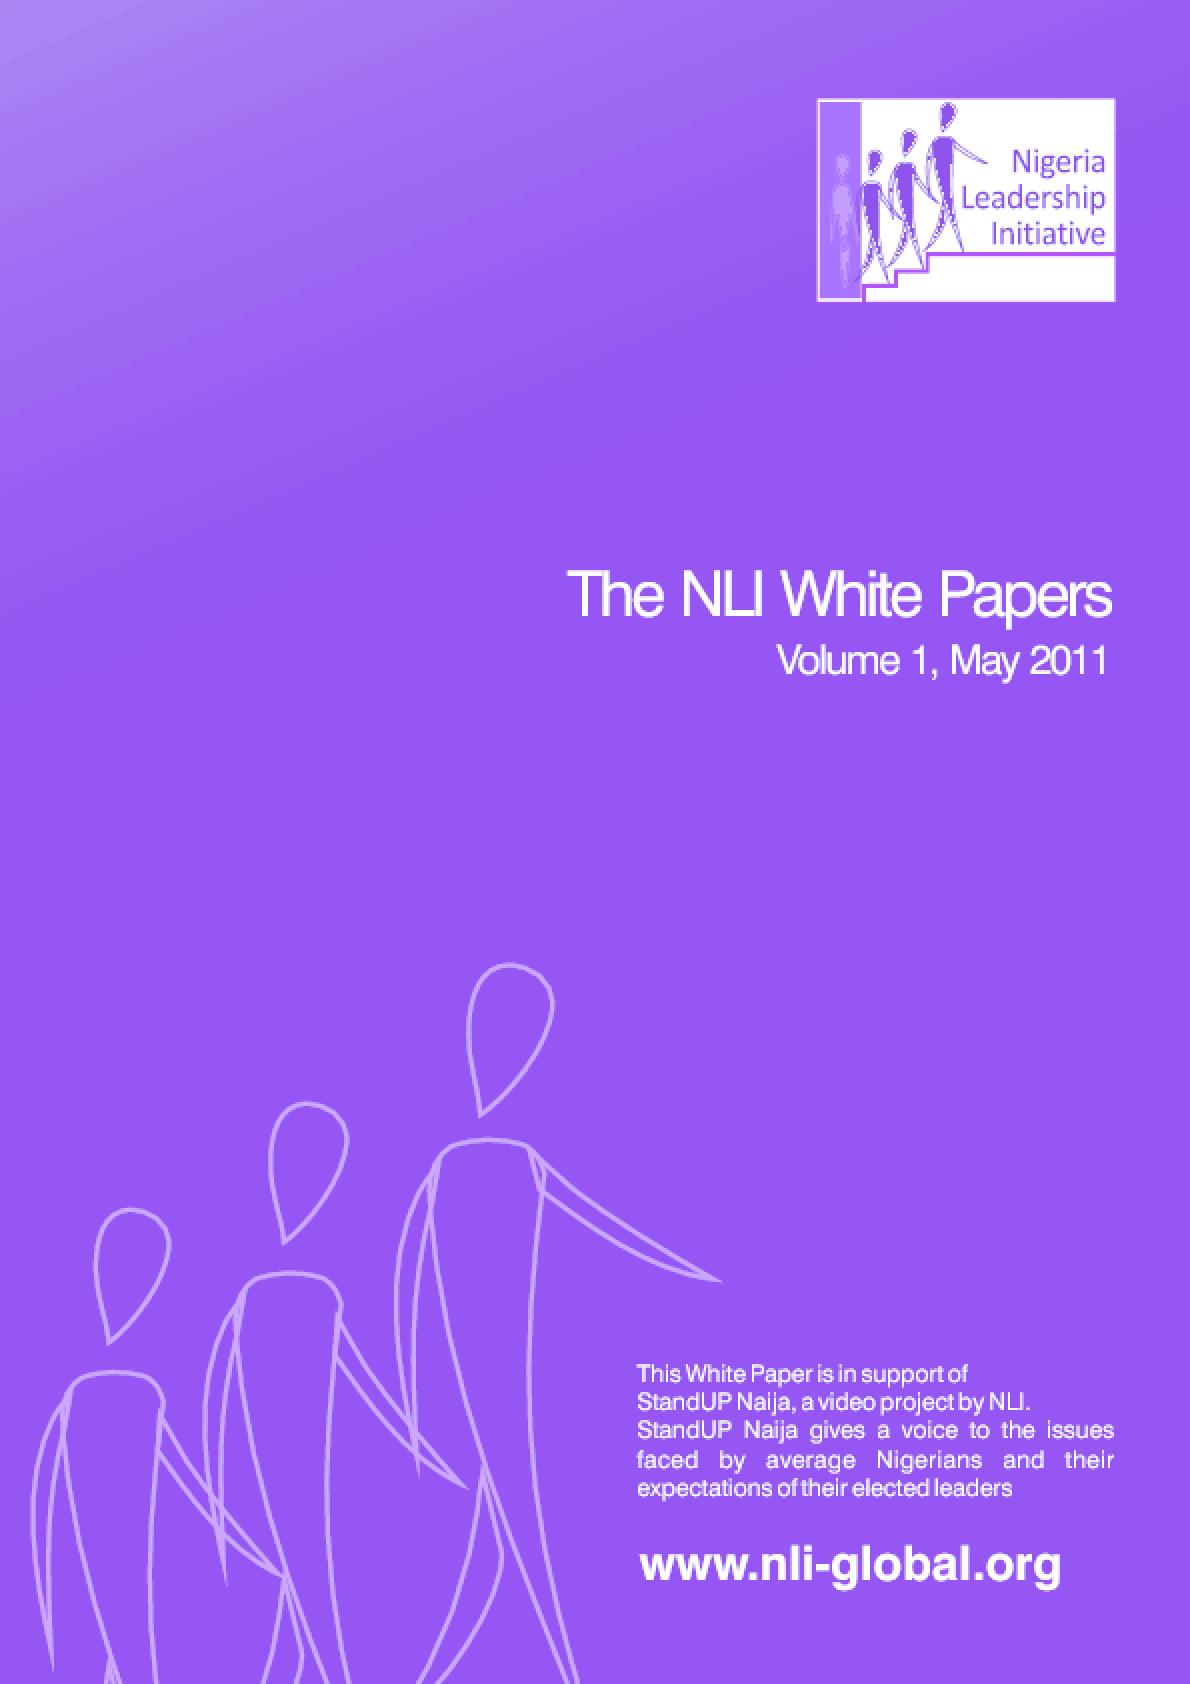 The Nigeria Leadership Initiative White Papers: Volume 1